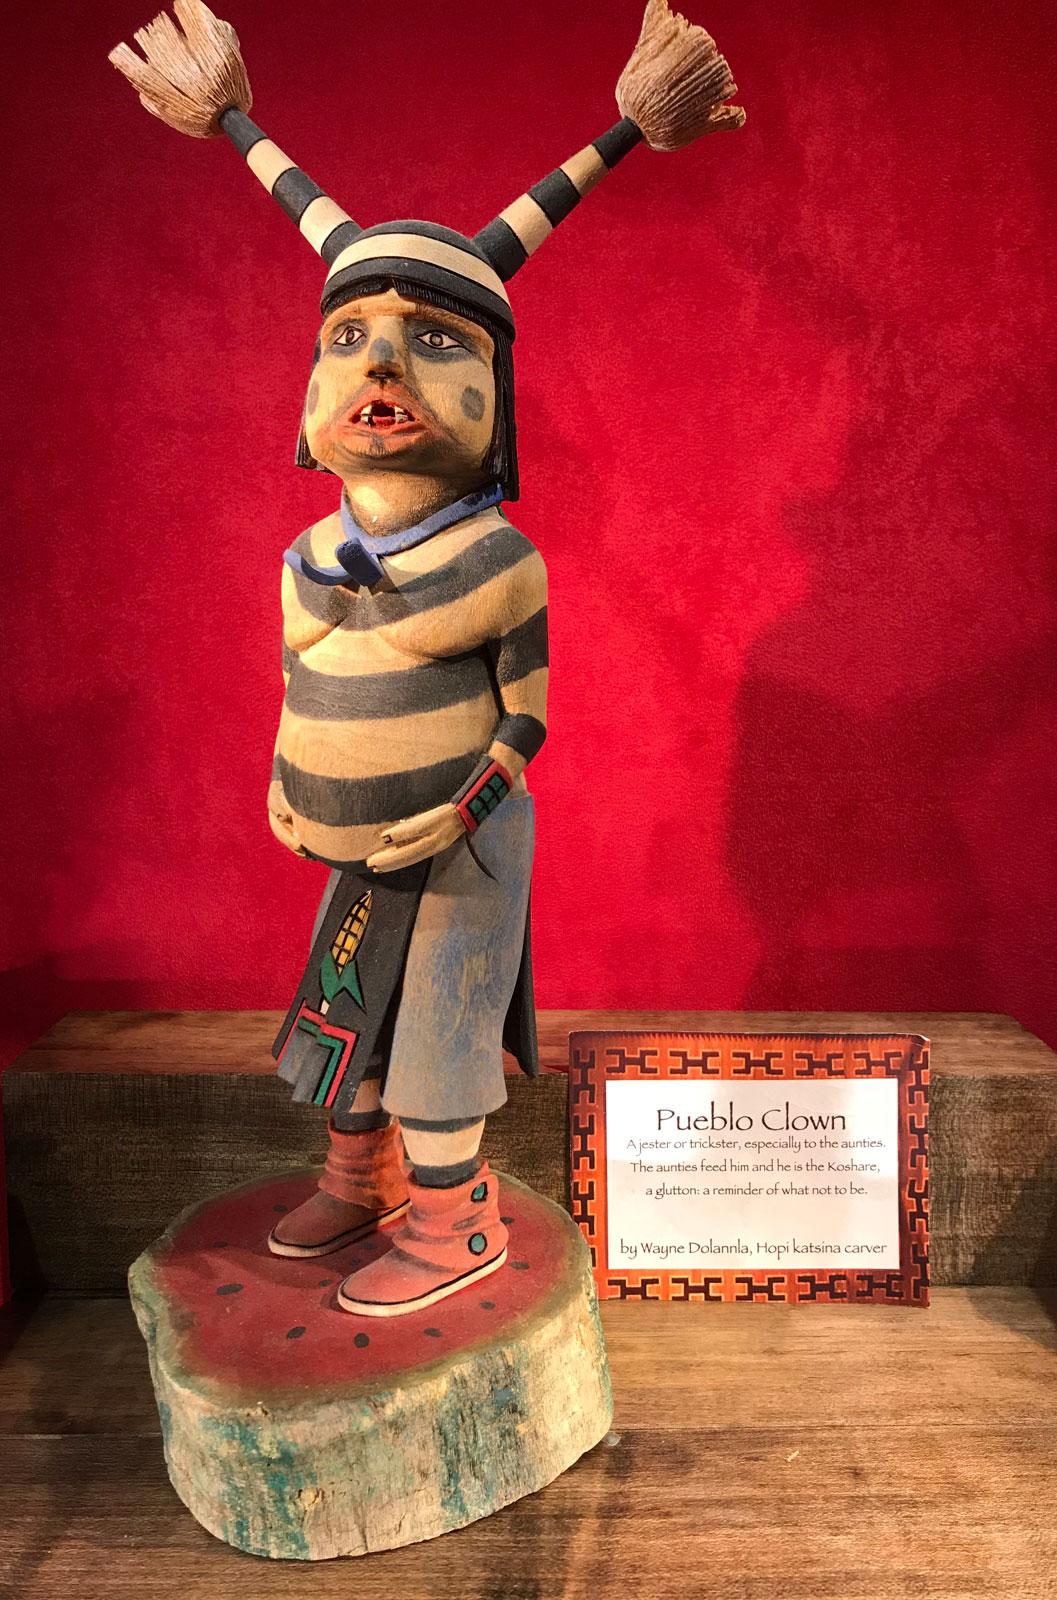 Katsina Pueblo Clown